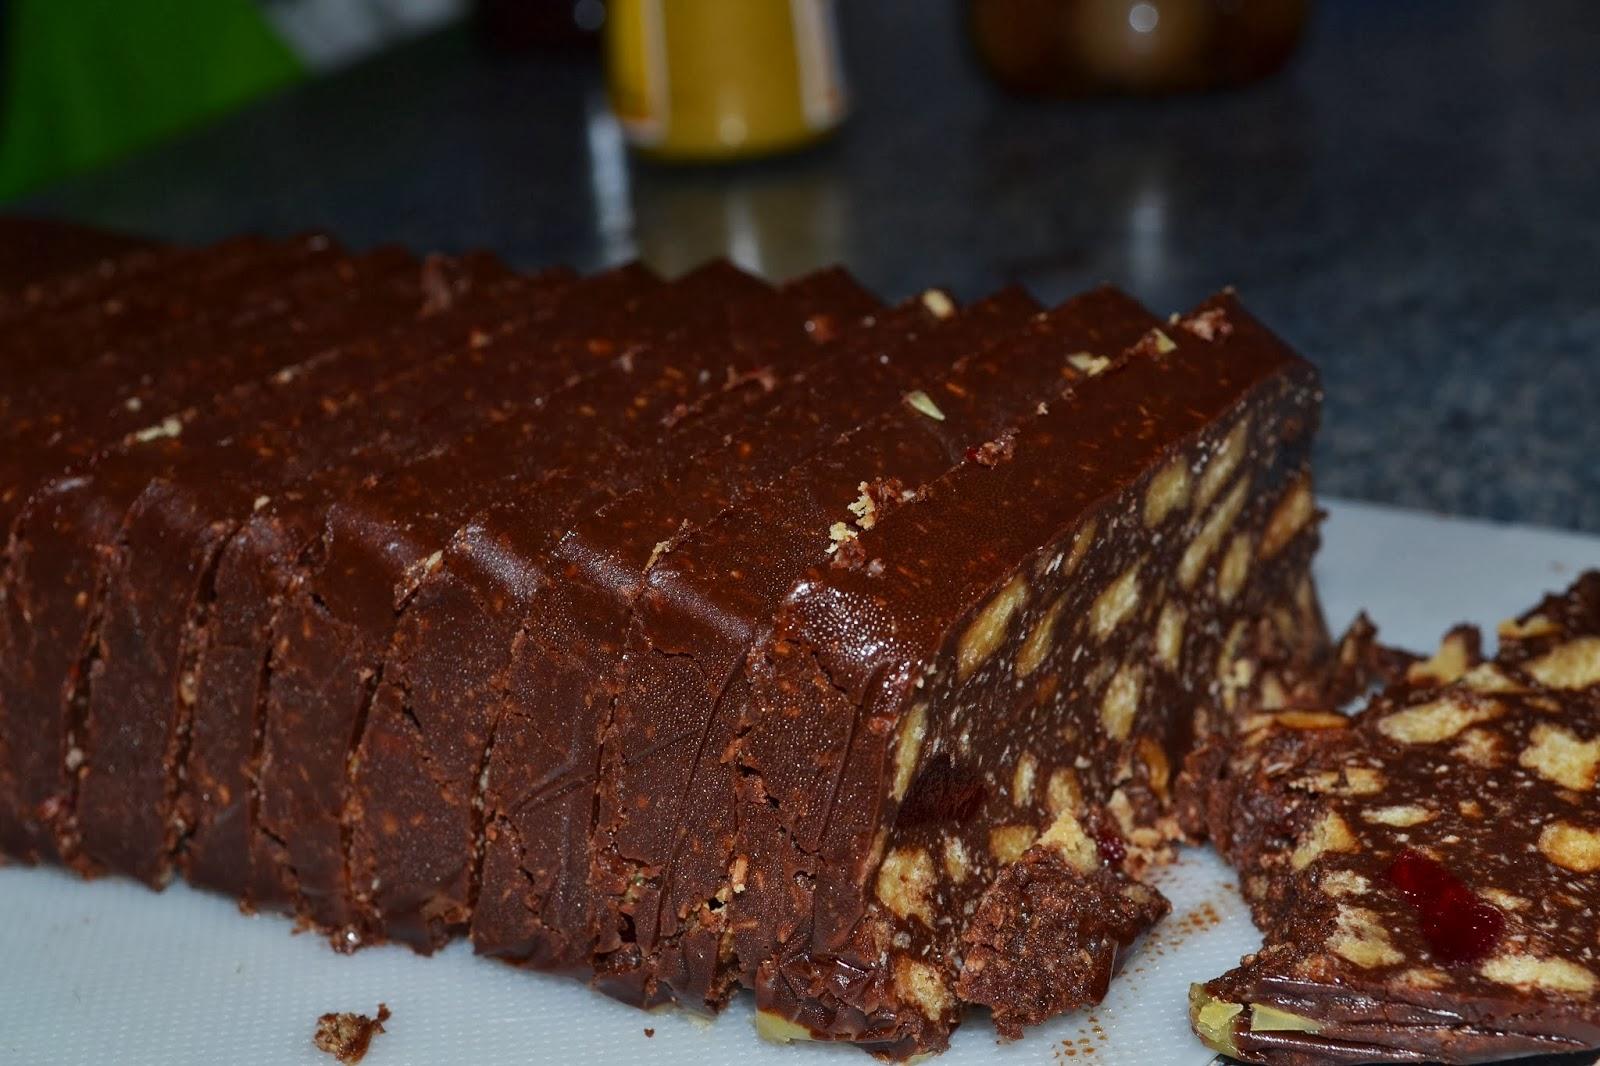 Chocolate log dessert